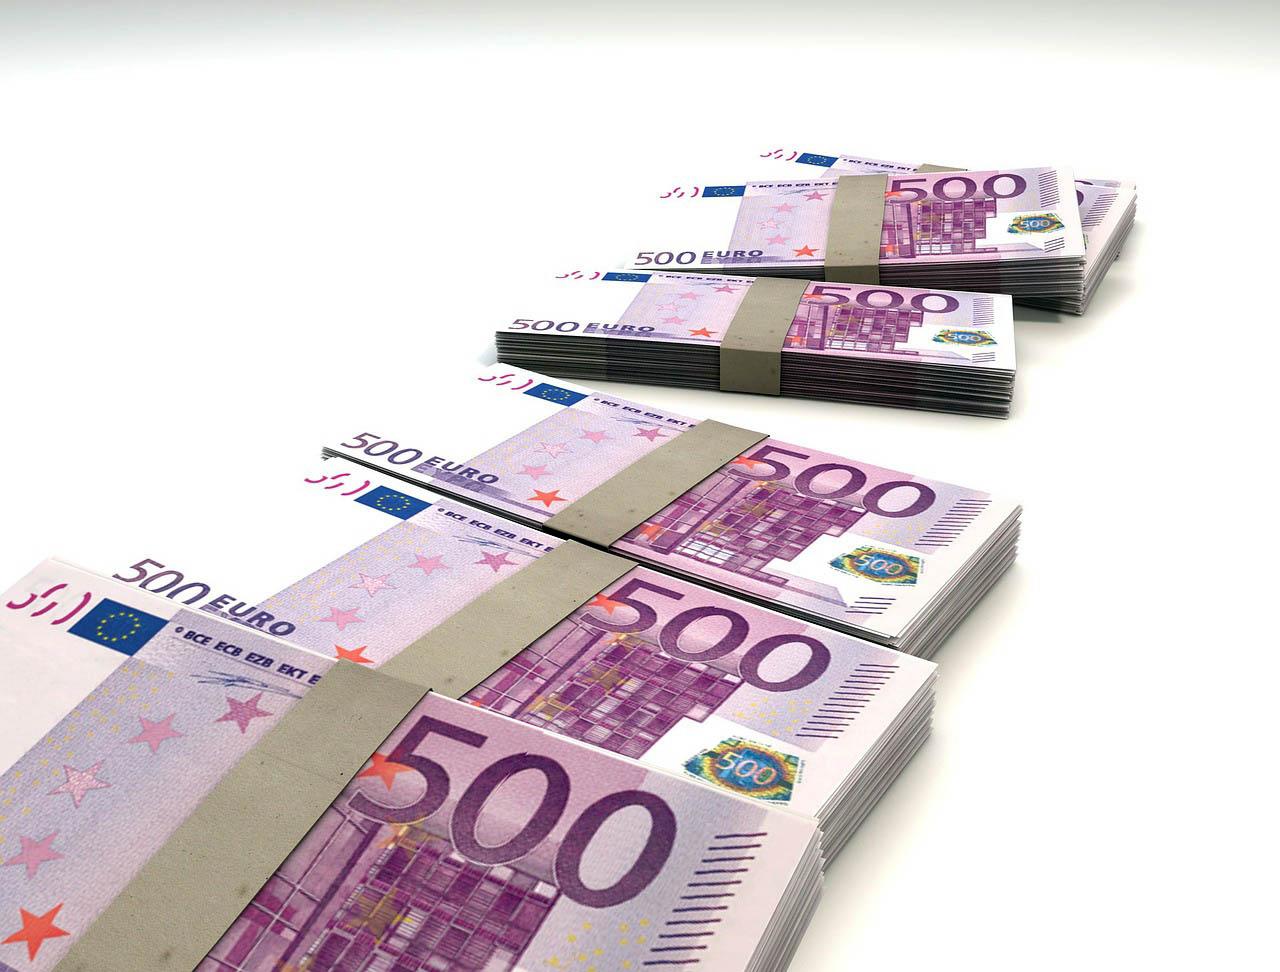 The Division Monatliche Kosten